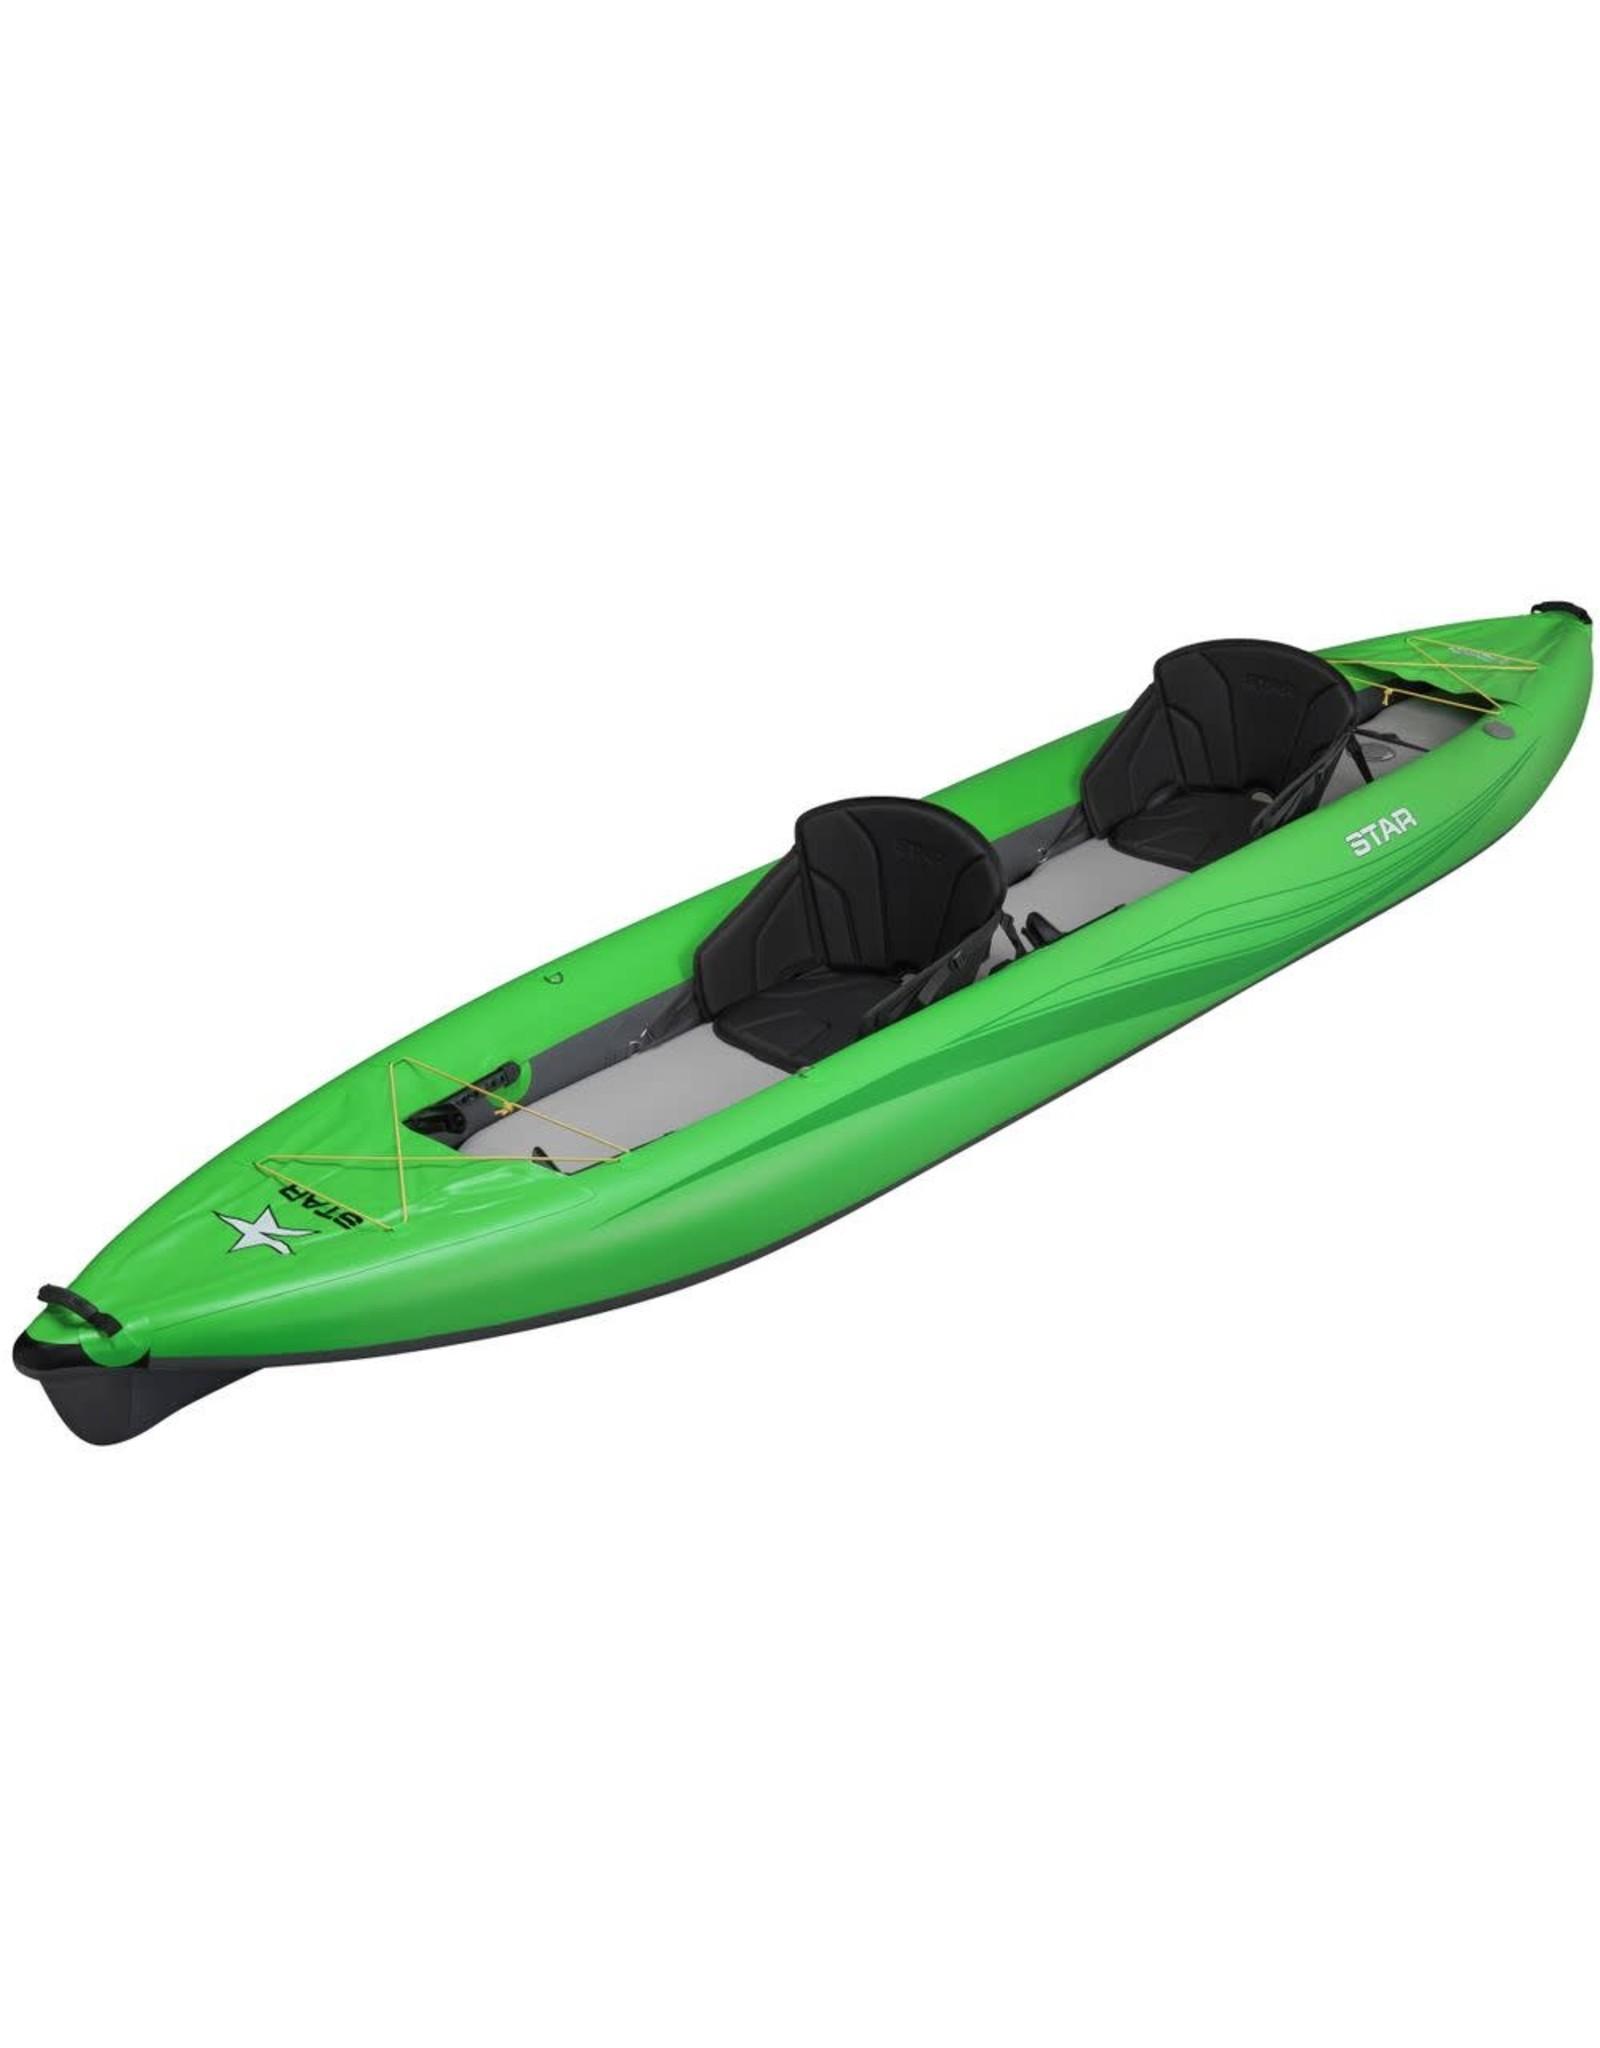 Star Star kayak Paragon Tandem gonflable vert 2020